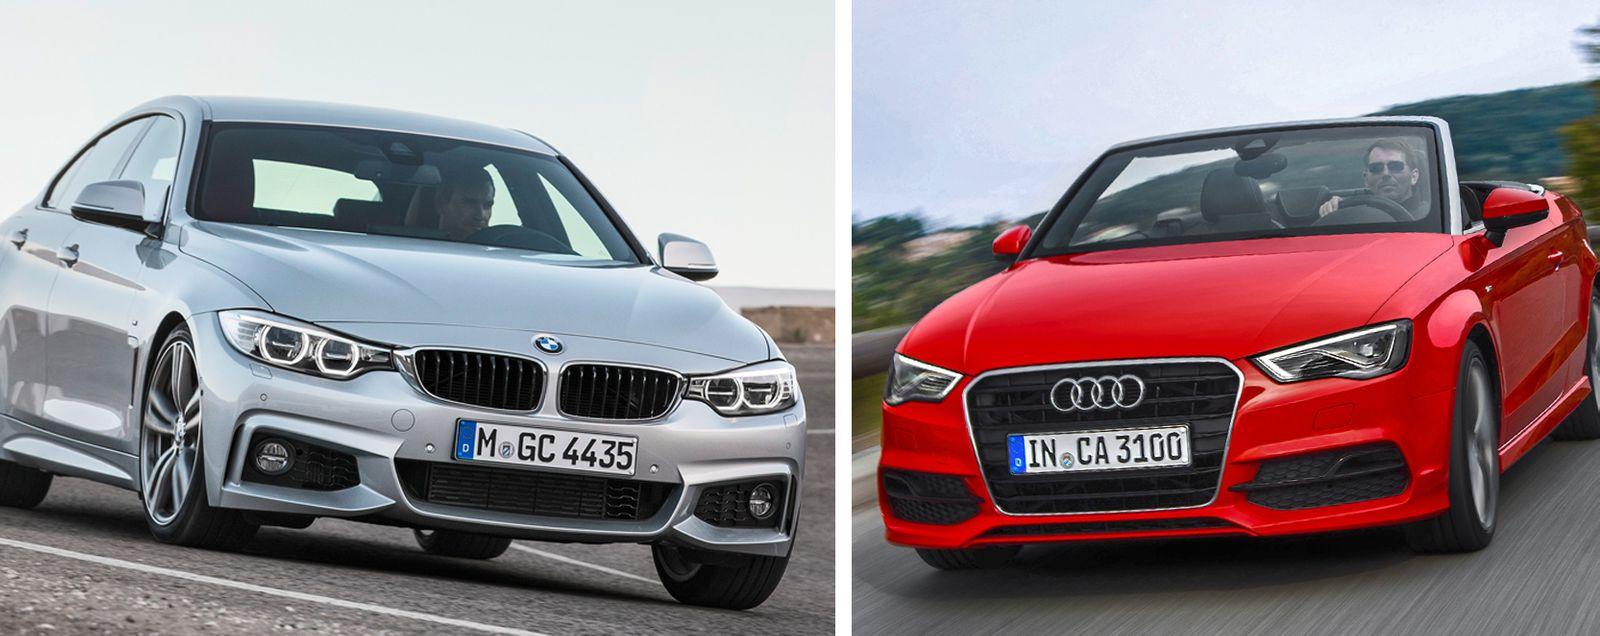 Kombo BMW4er / Audi A3